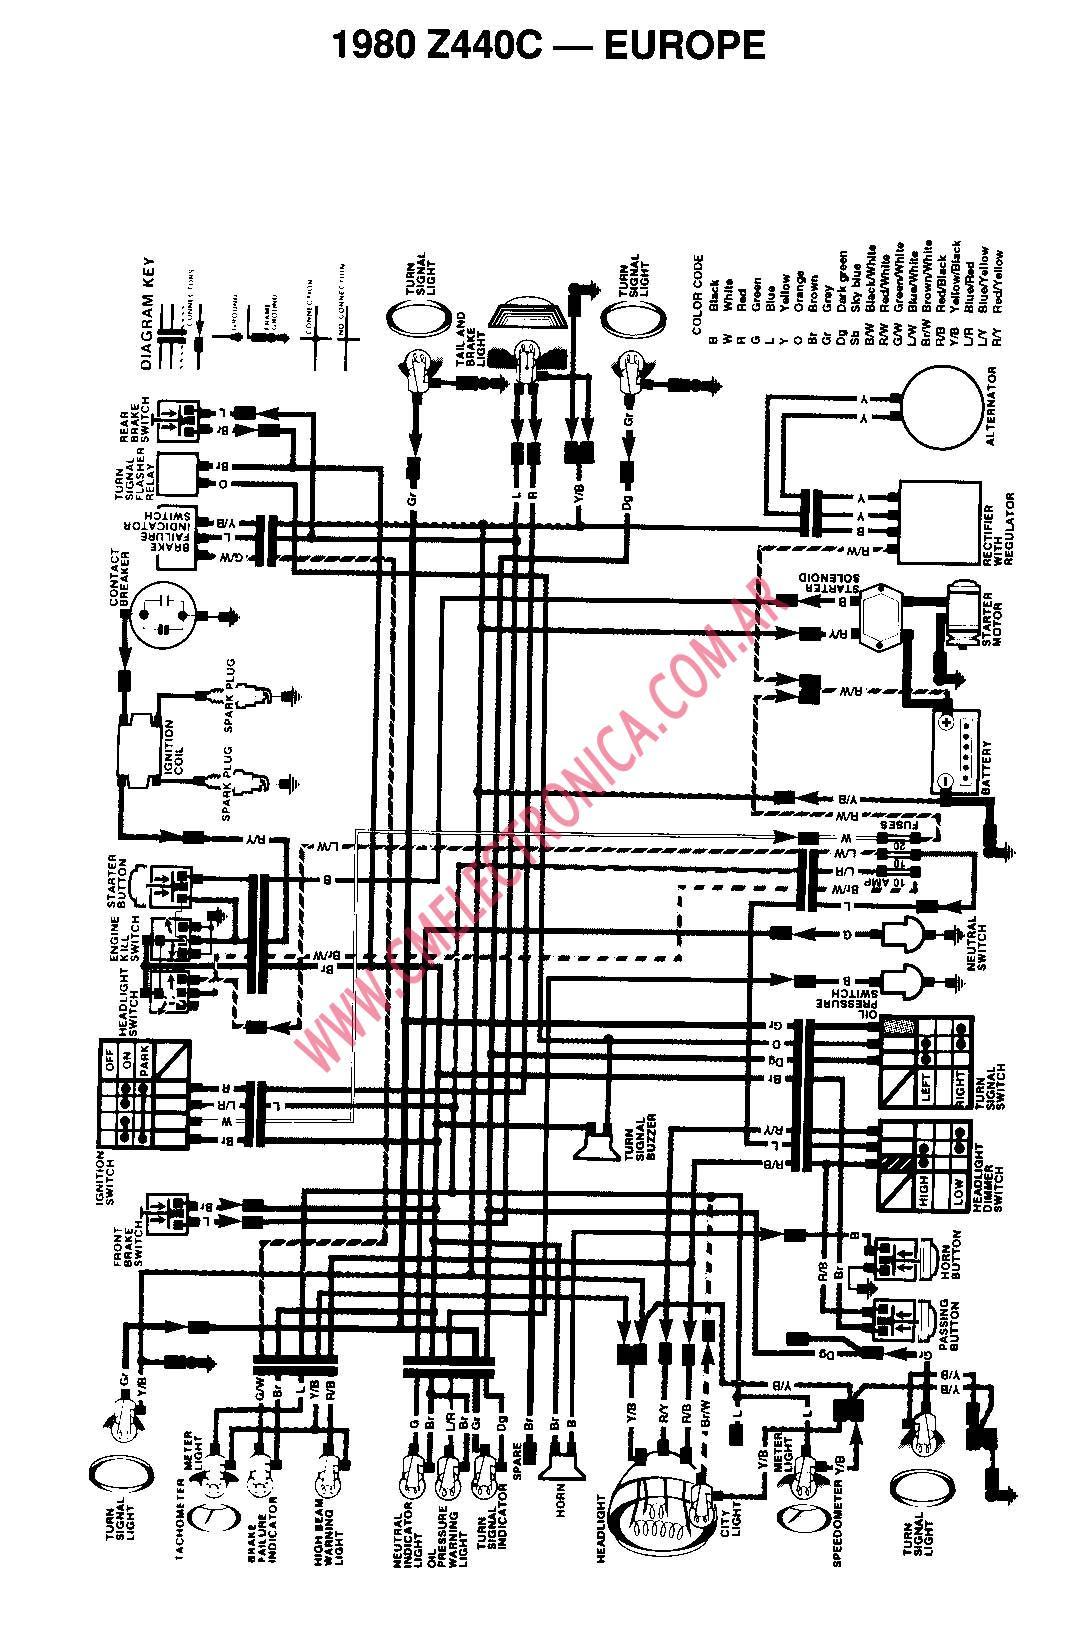 DIAGRAM] Free Kawasaki 400 Bayou Wiring Diagram FULL Version HD Quality Wiring  Diagram - ELECTRICMAN5.PUMABASKETS.FRWiring Diagram